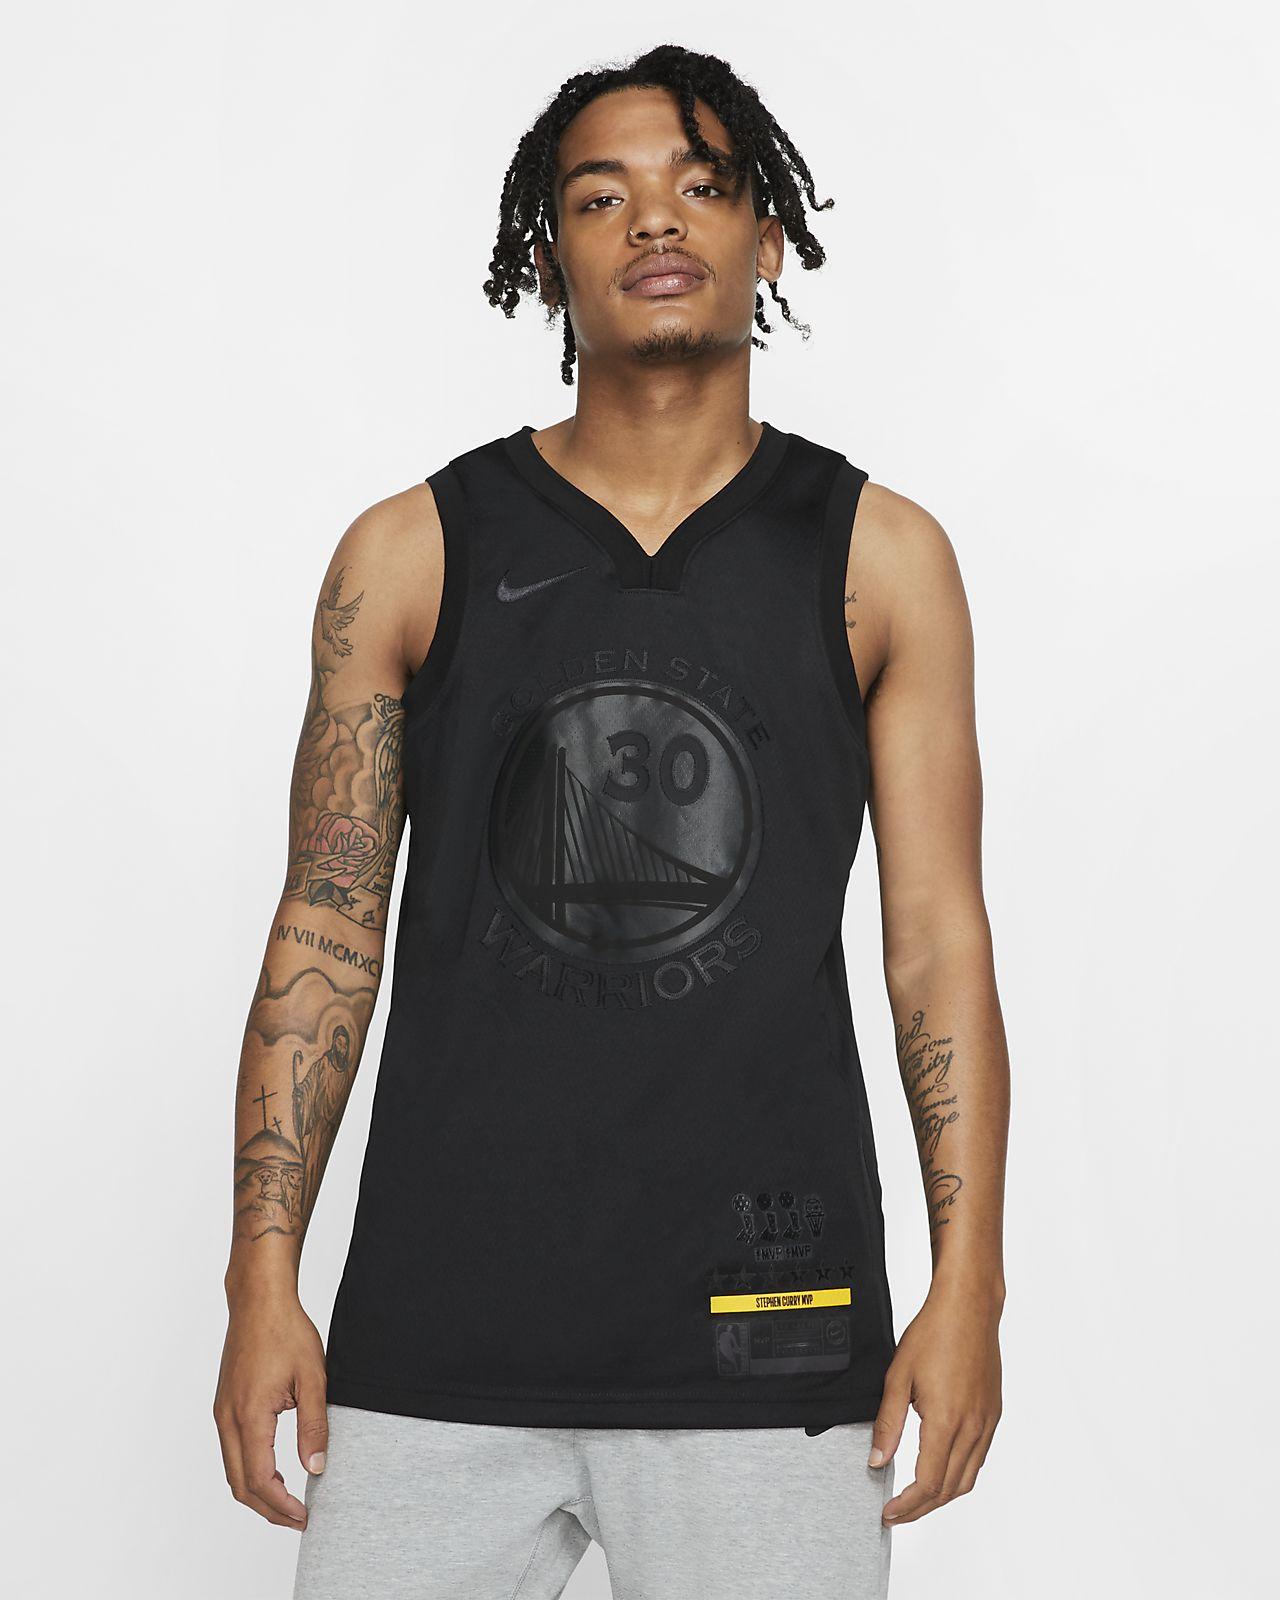 Stephen Curry MVP Swingman (Golden State Warriors) Camiseta Nike NBA Connected - Hombre